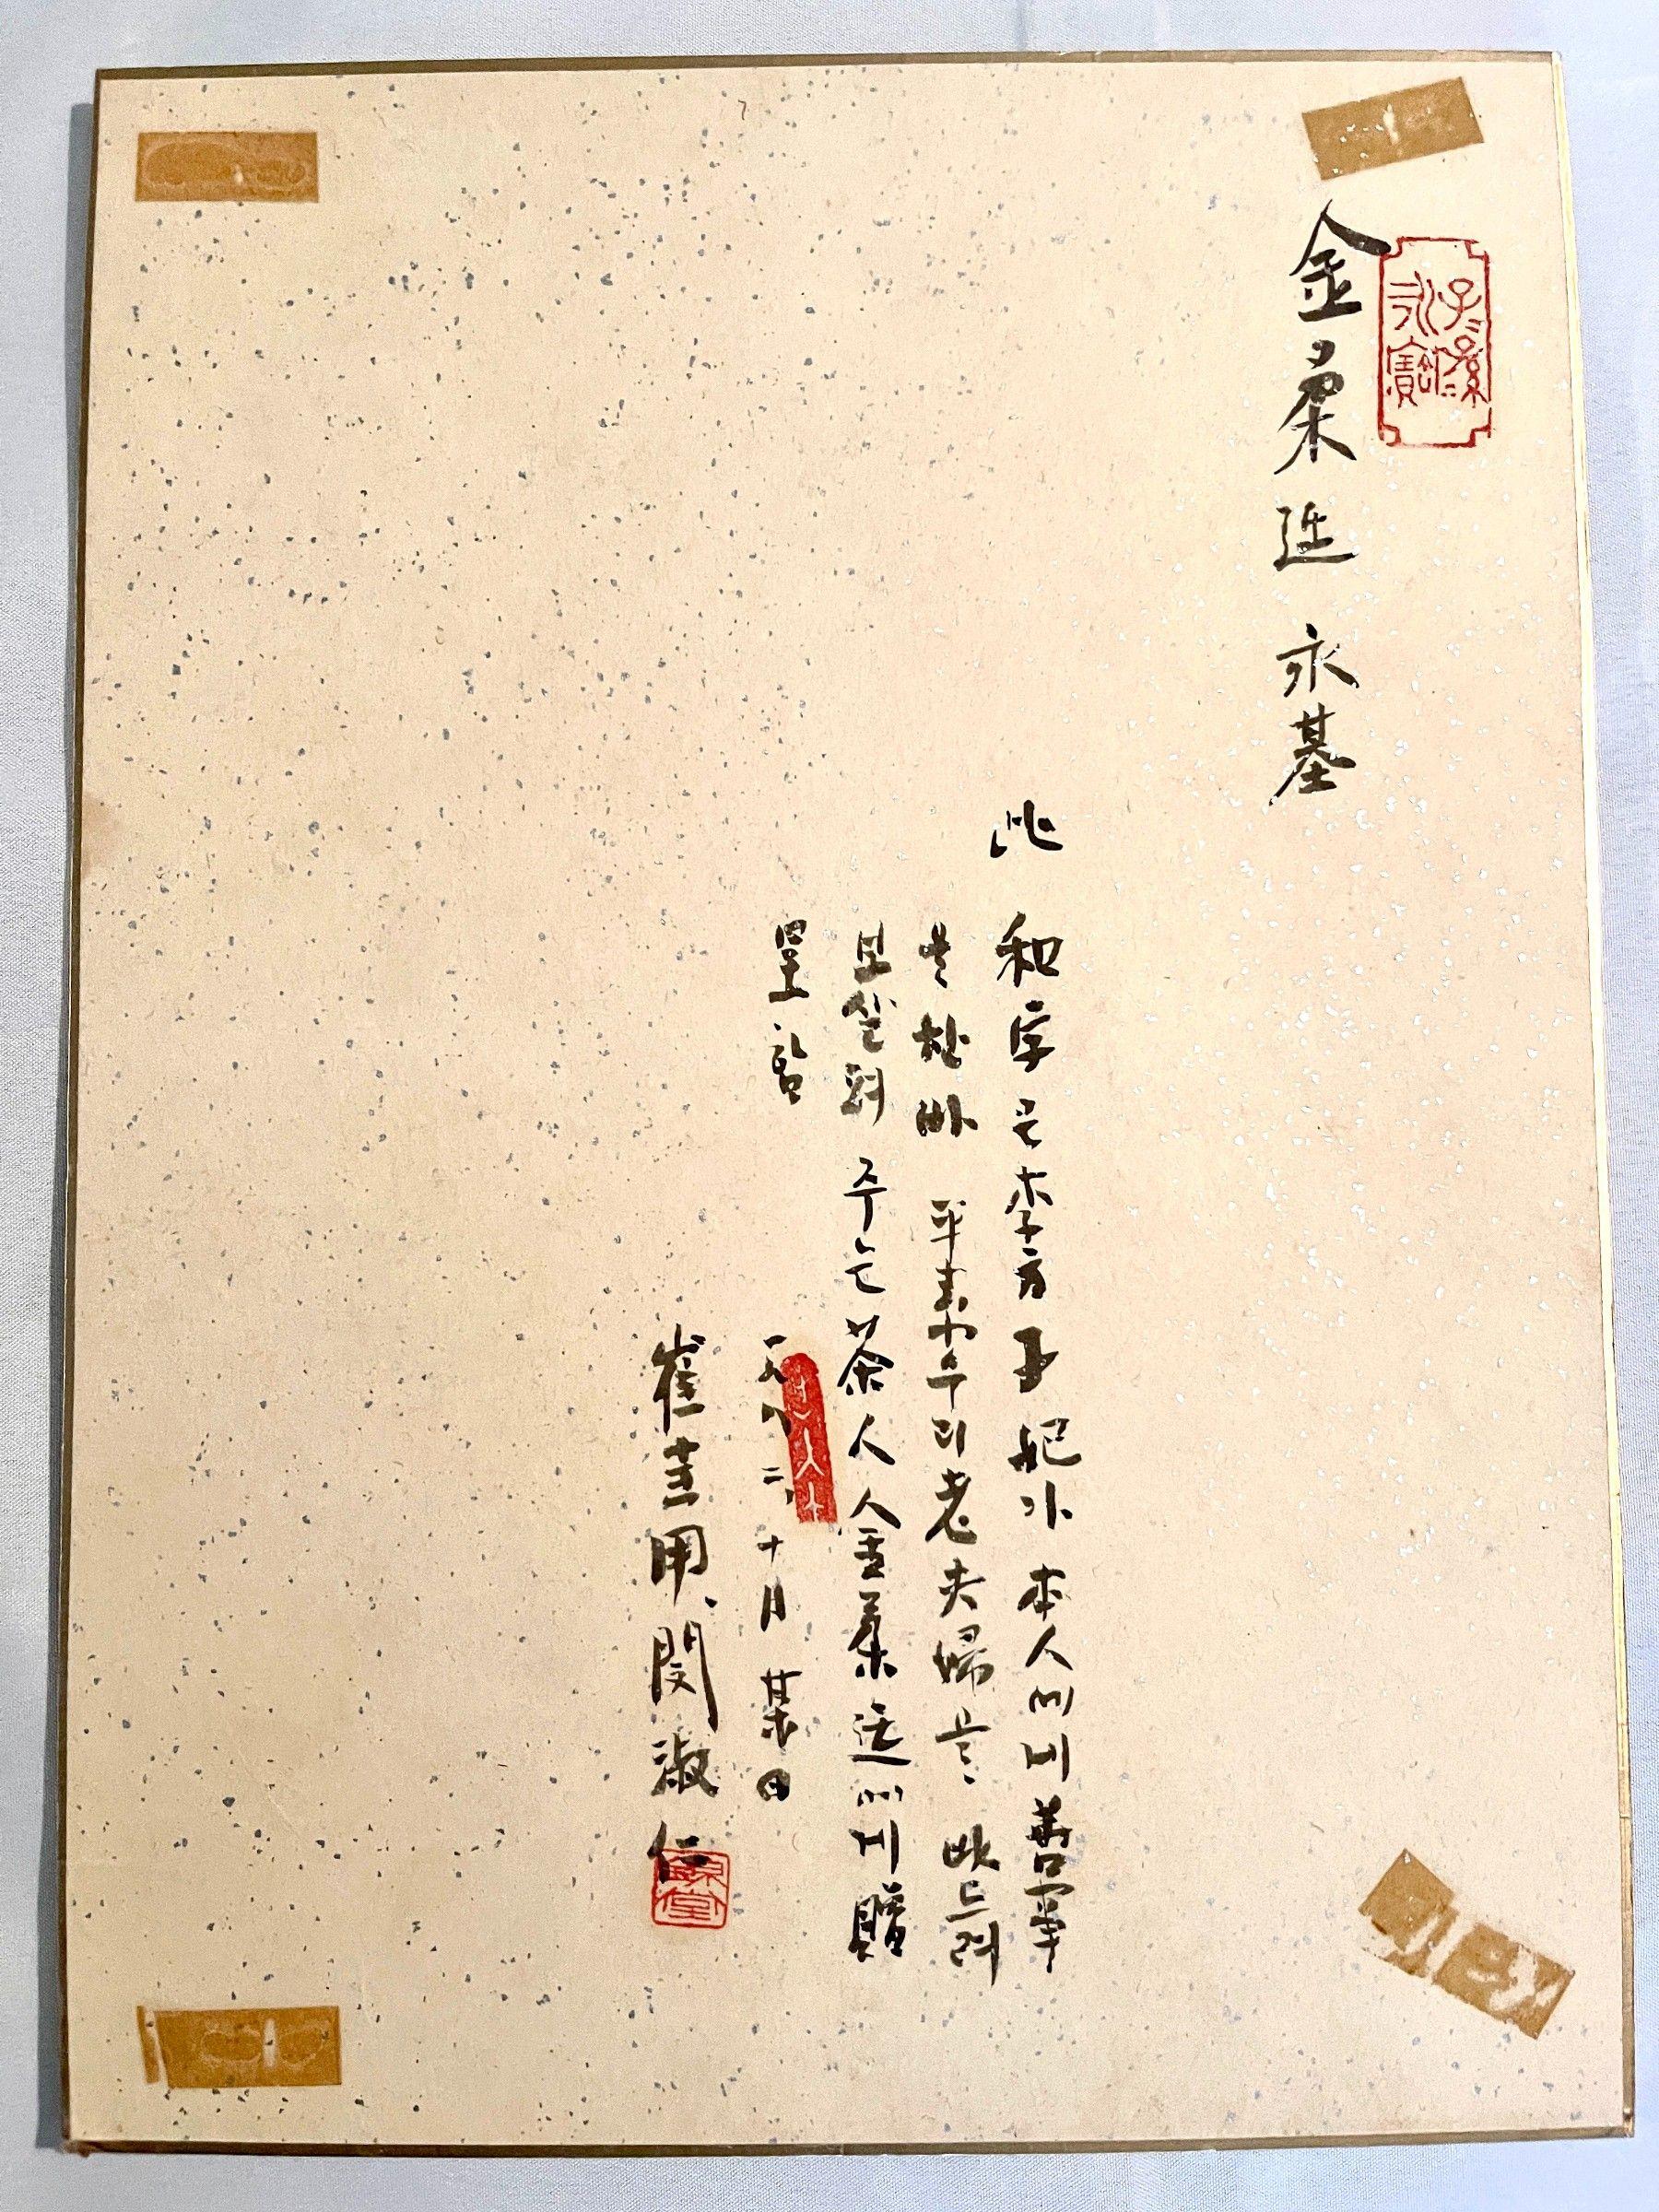 Rare Calligraphy by Korea's Last Princess, Yi Bang Ja (1901-1989)